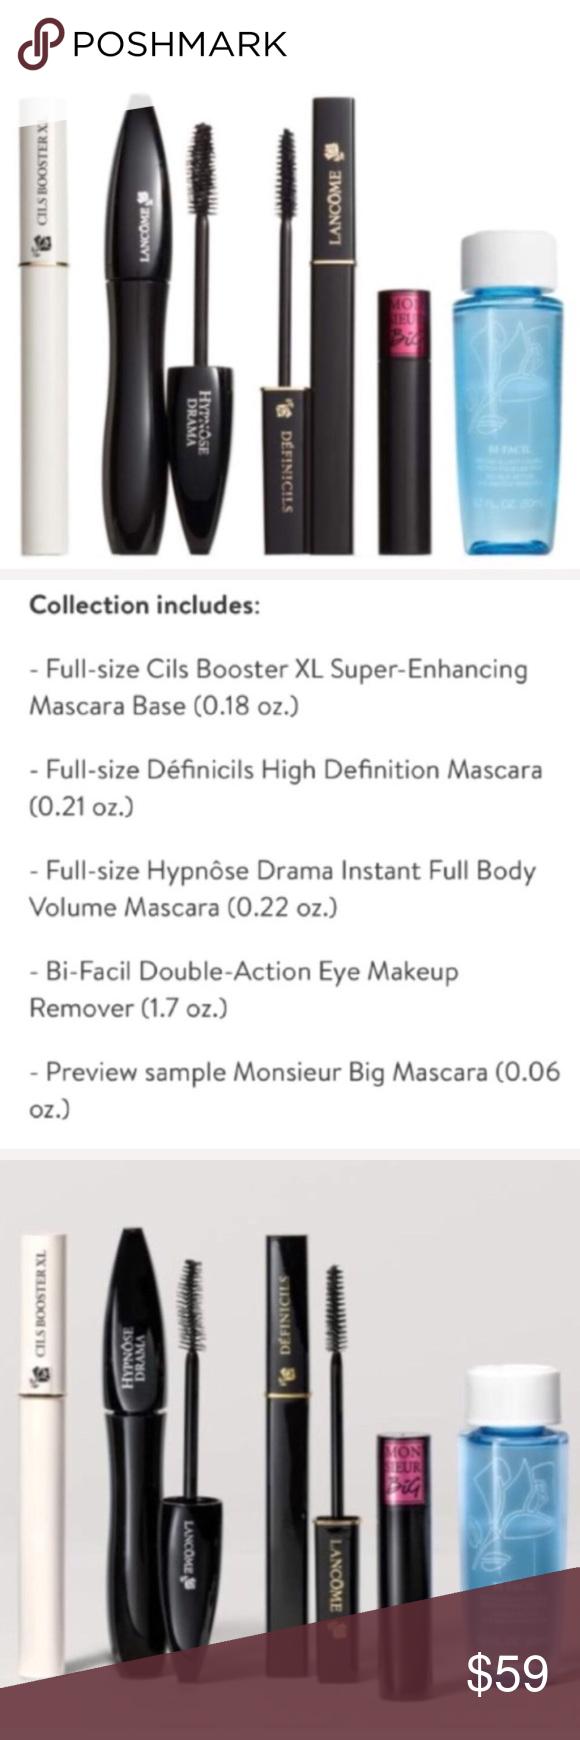 NEW!🦋Lancôme 5Pc Mascara Master Set. 🦋NEW!🦋Lancôme 5Pc